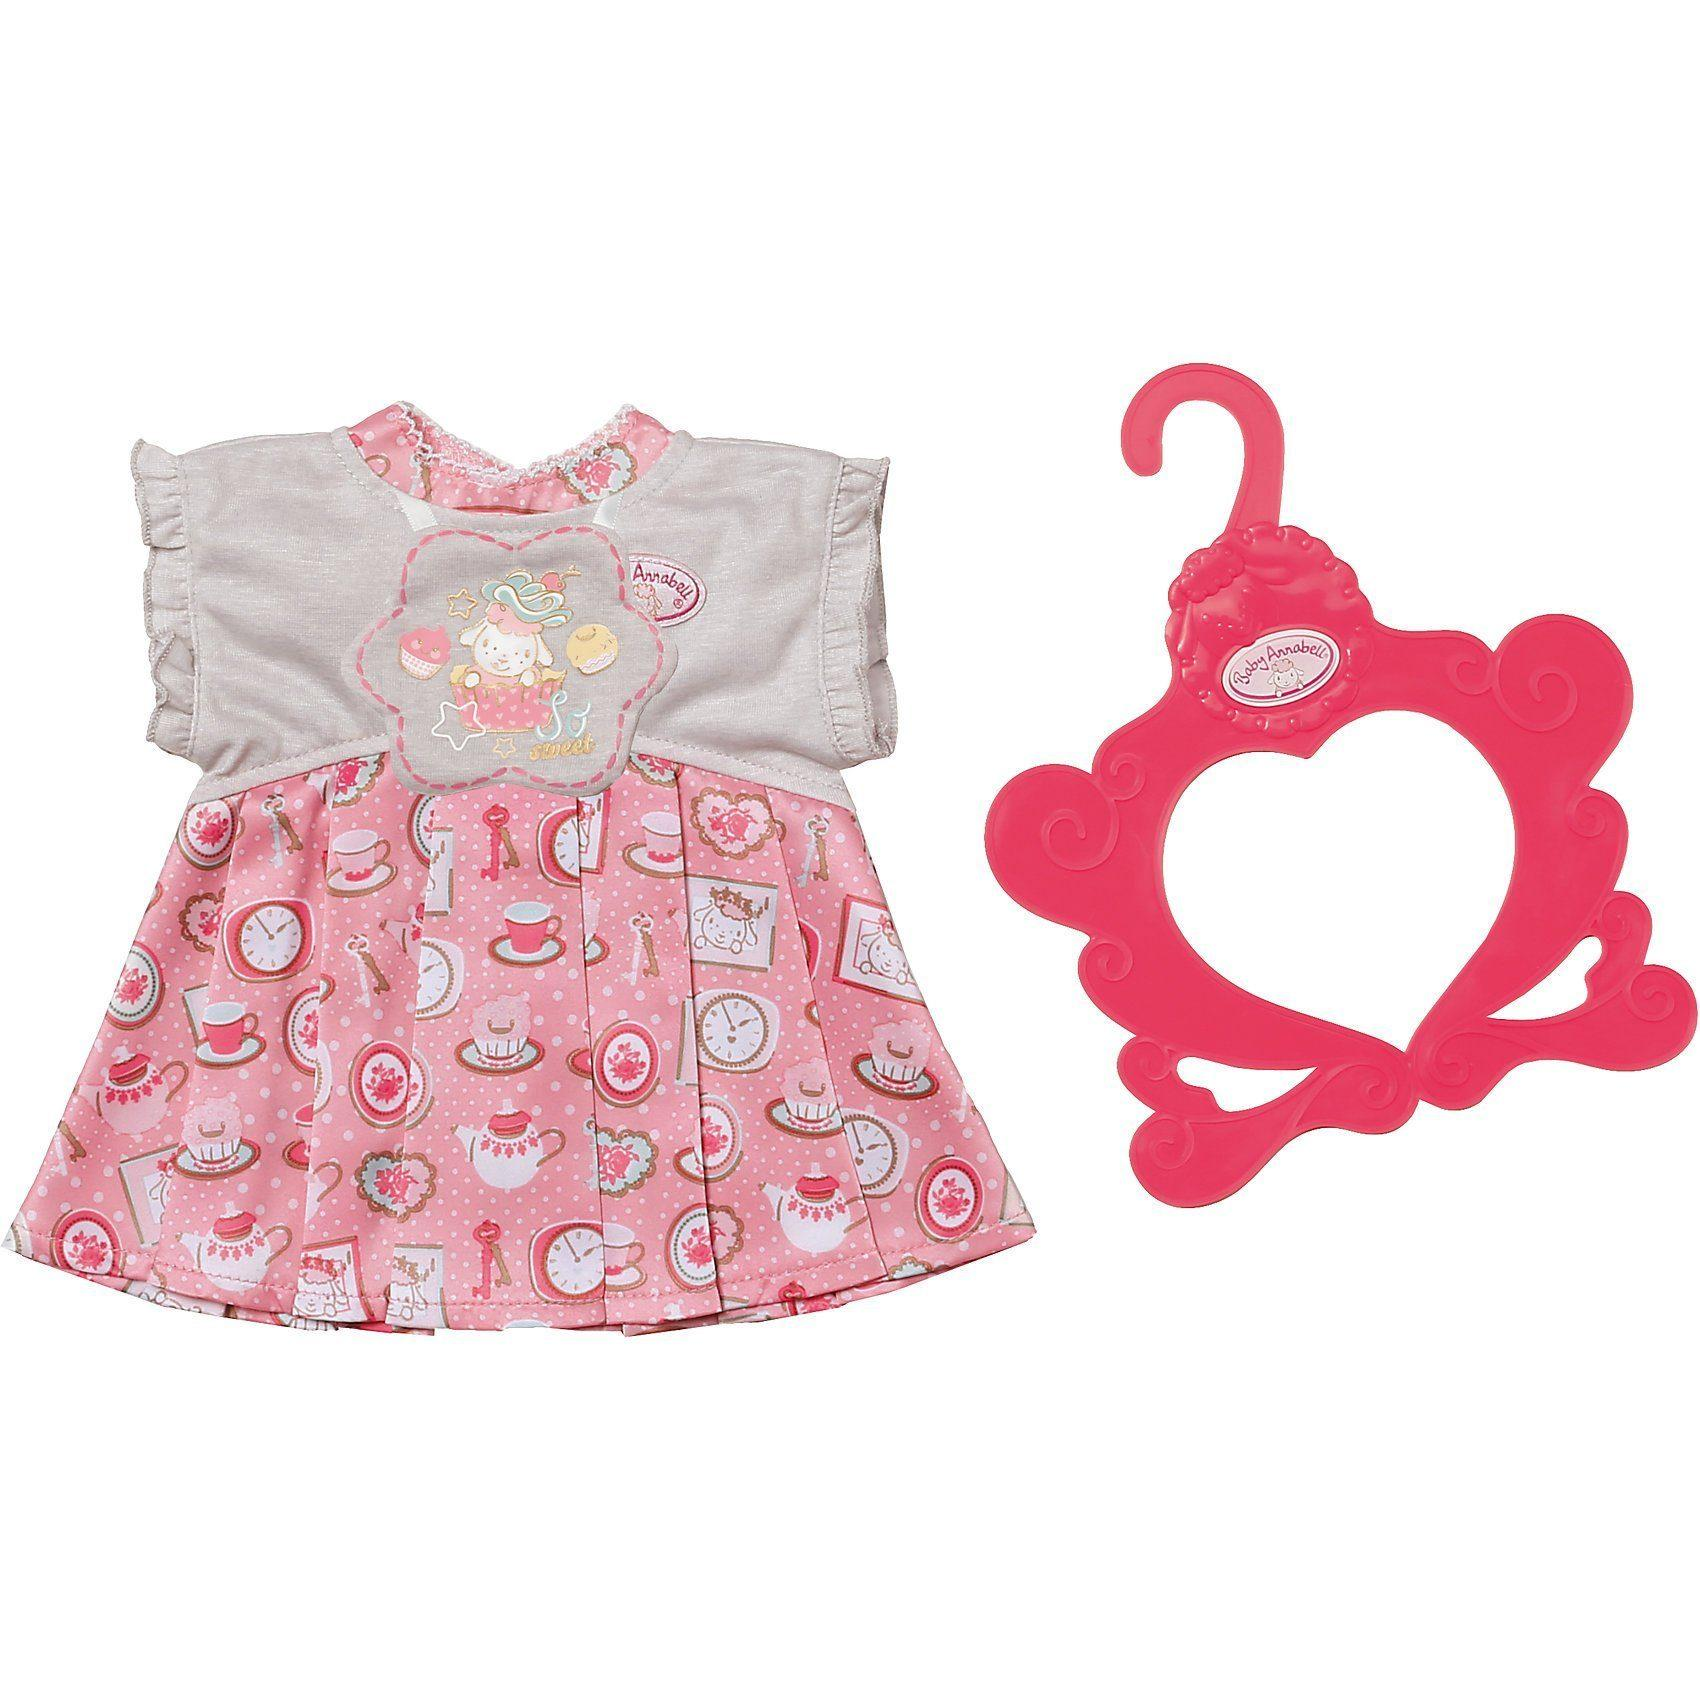 Платье Baby Annabell серо - розовое, 46 см